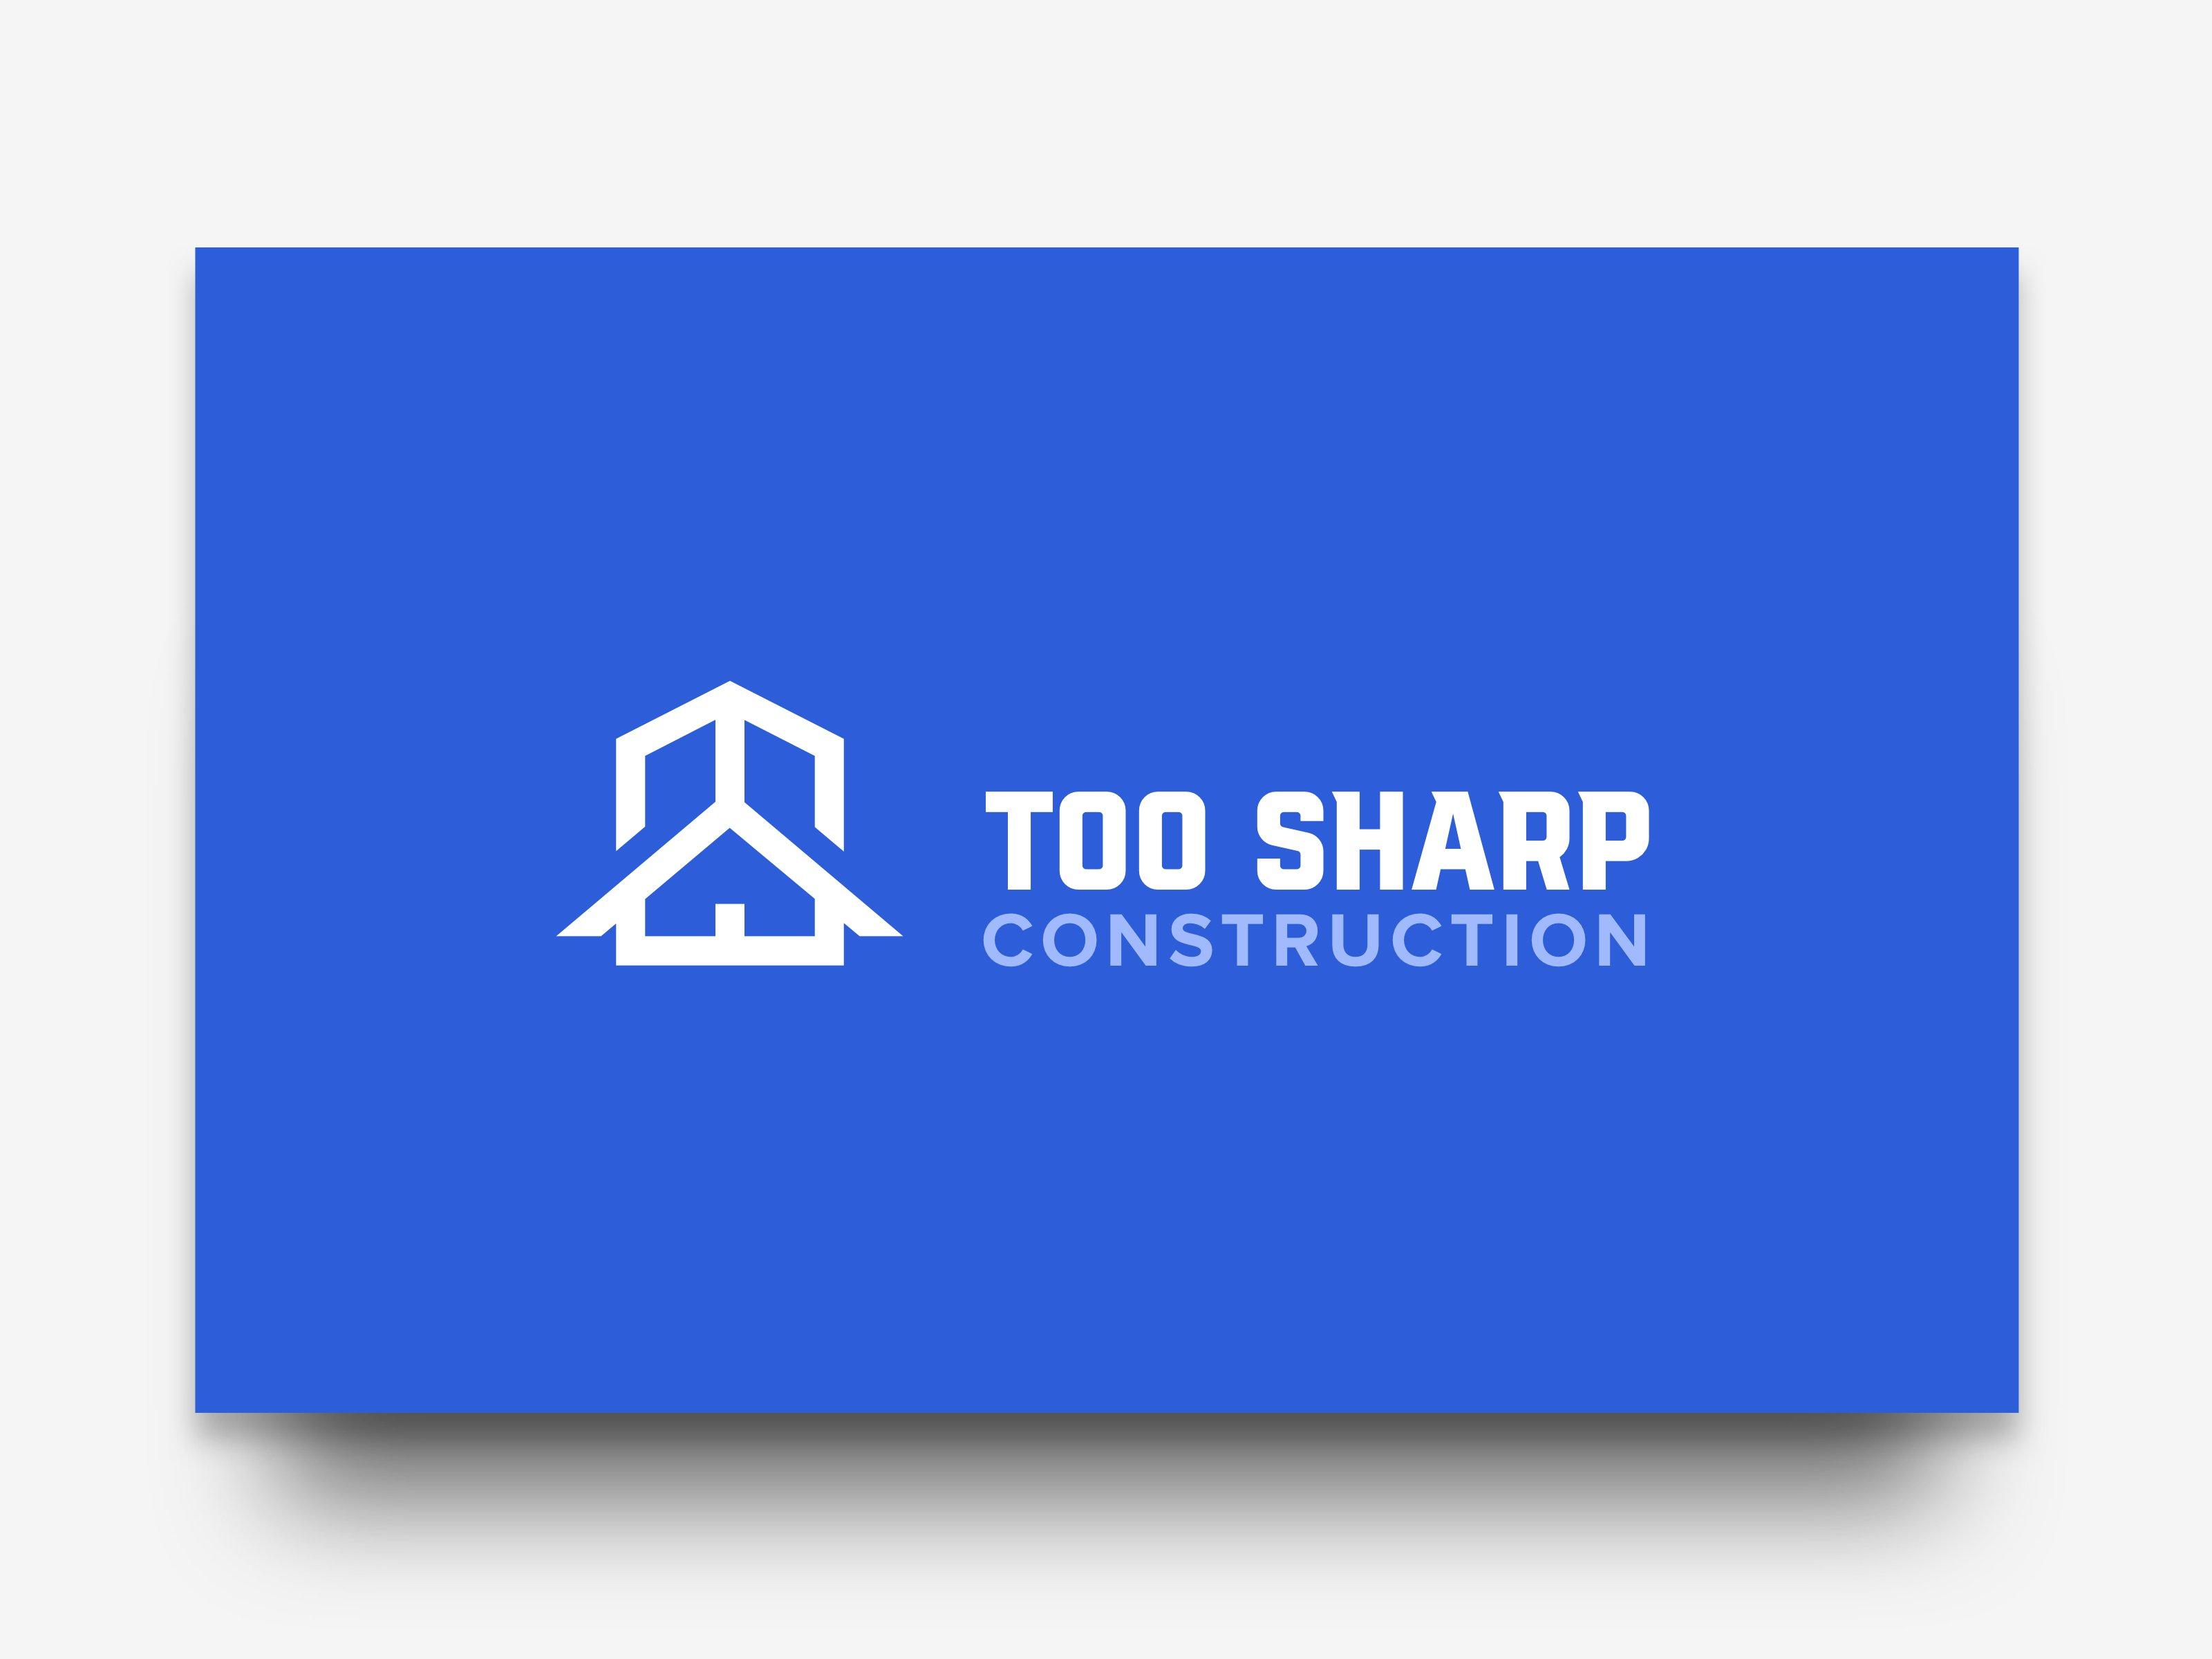 Too Sharp Construction Logo